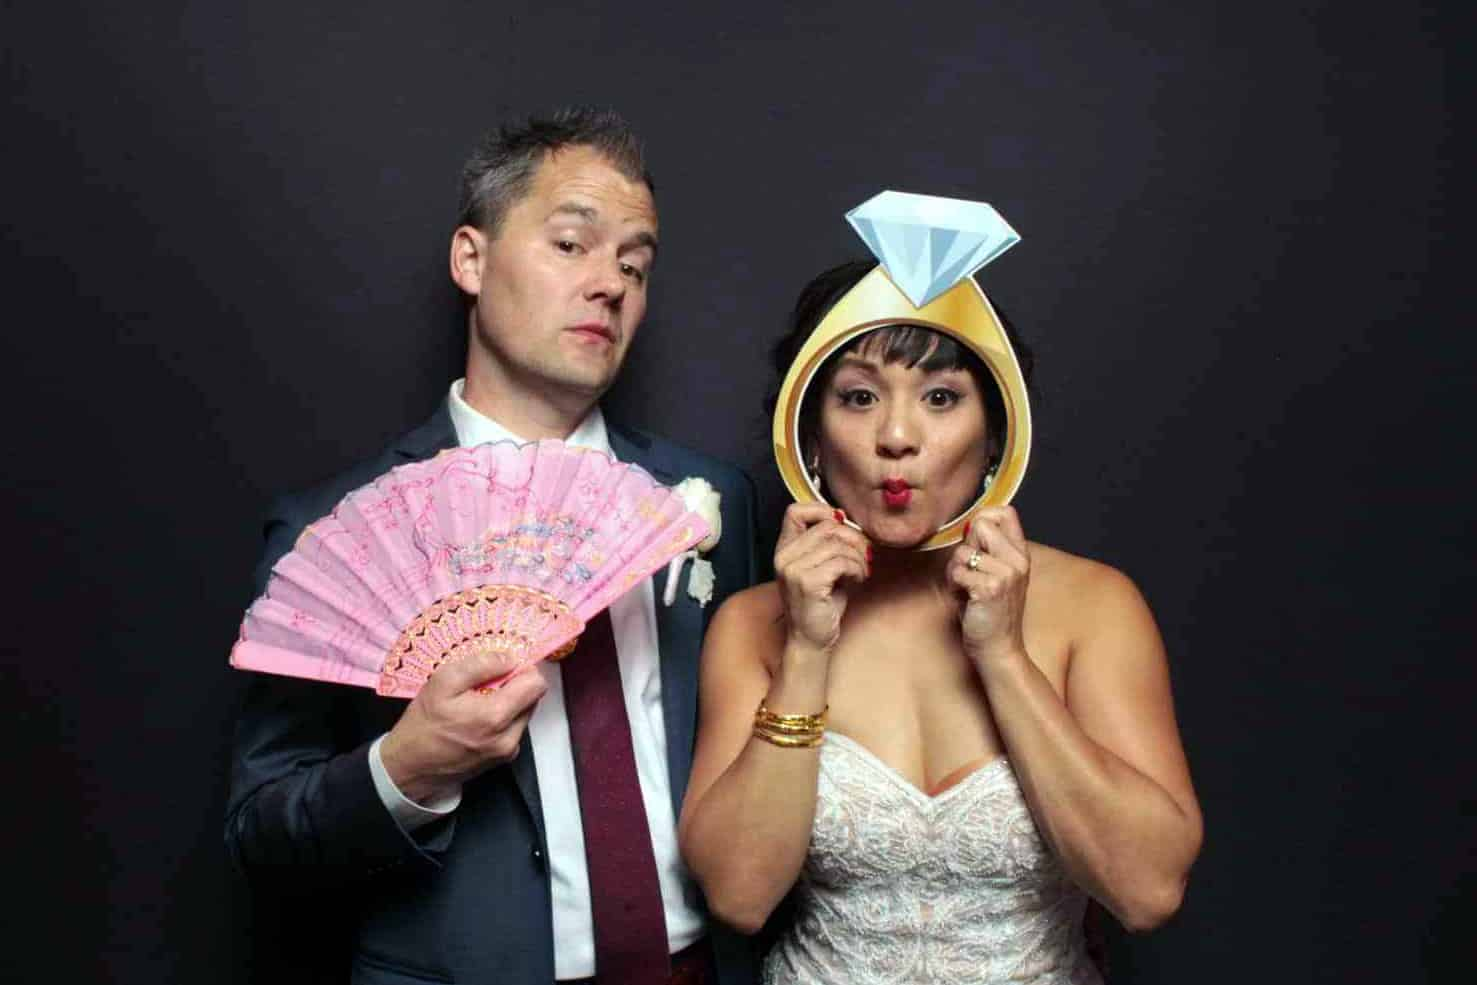 Sample Wedding Photo Booth Photo